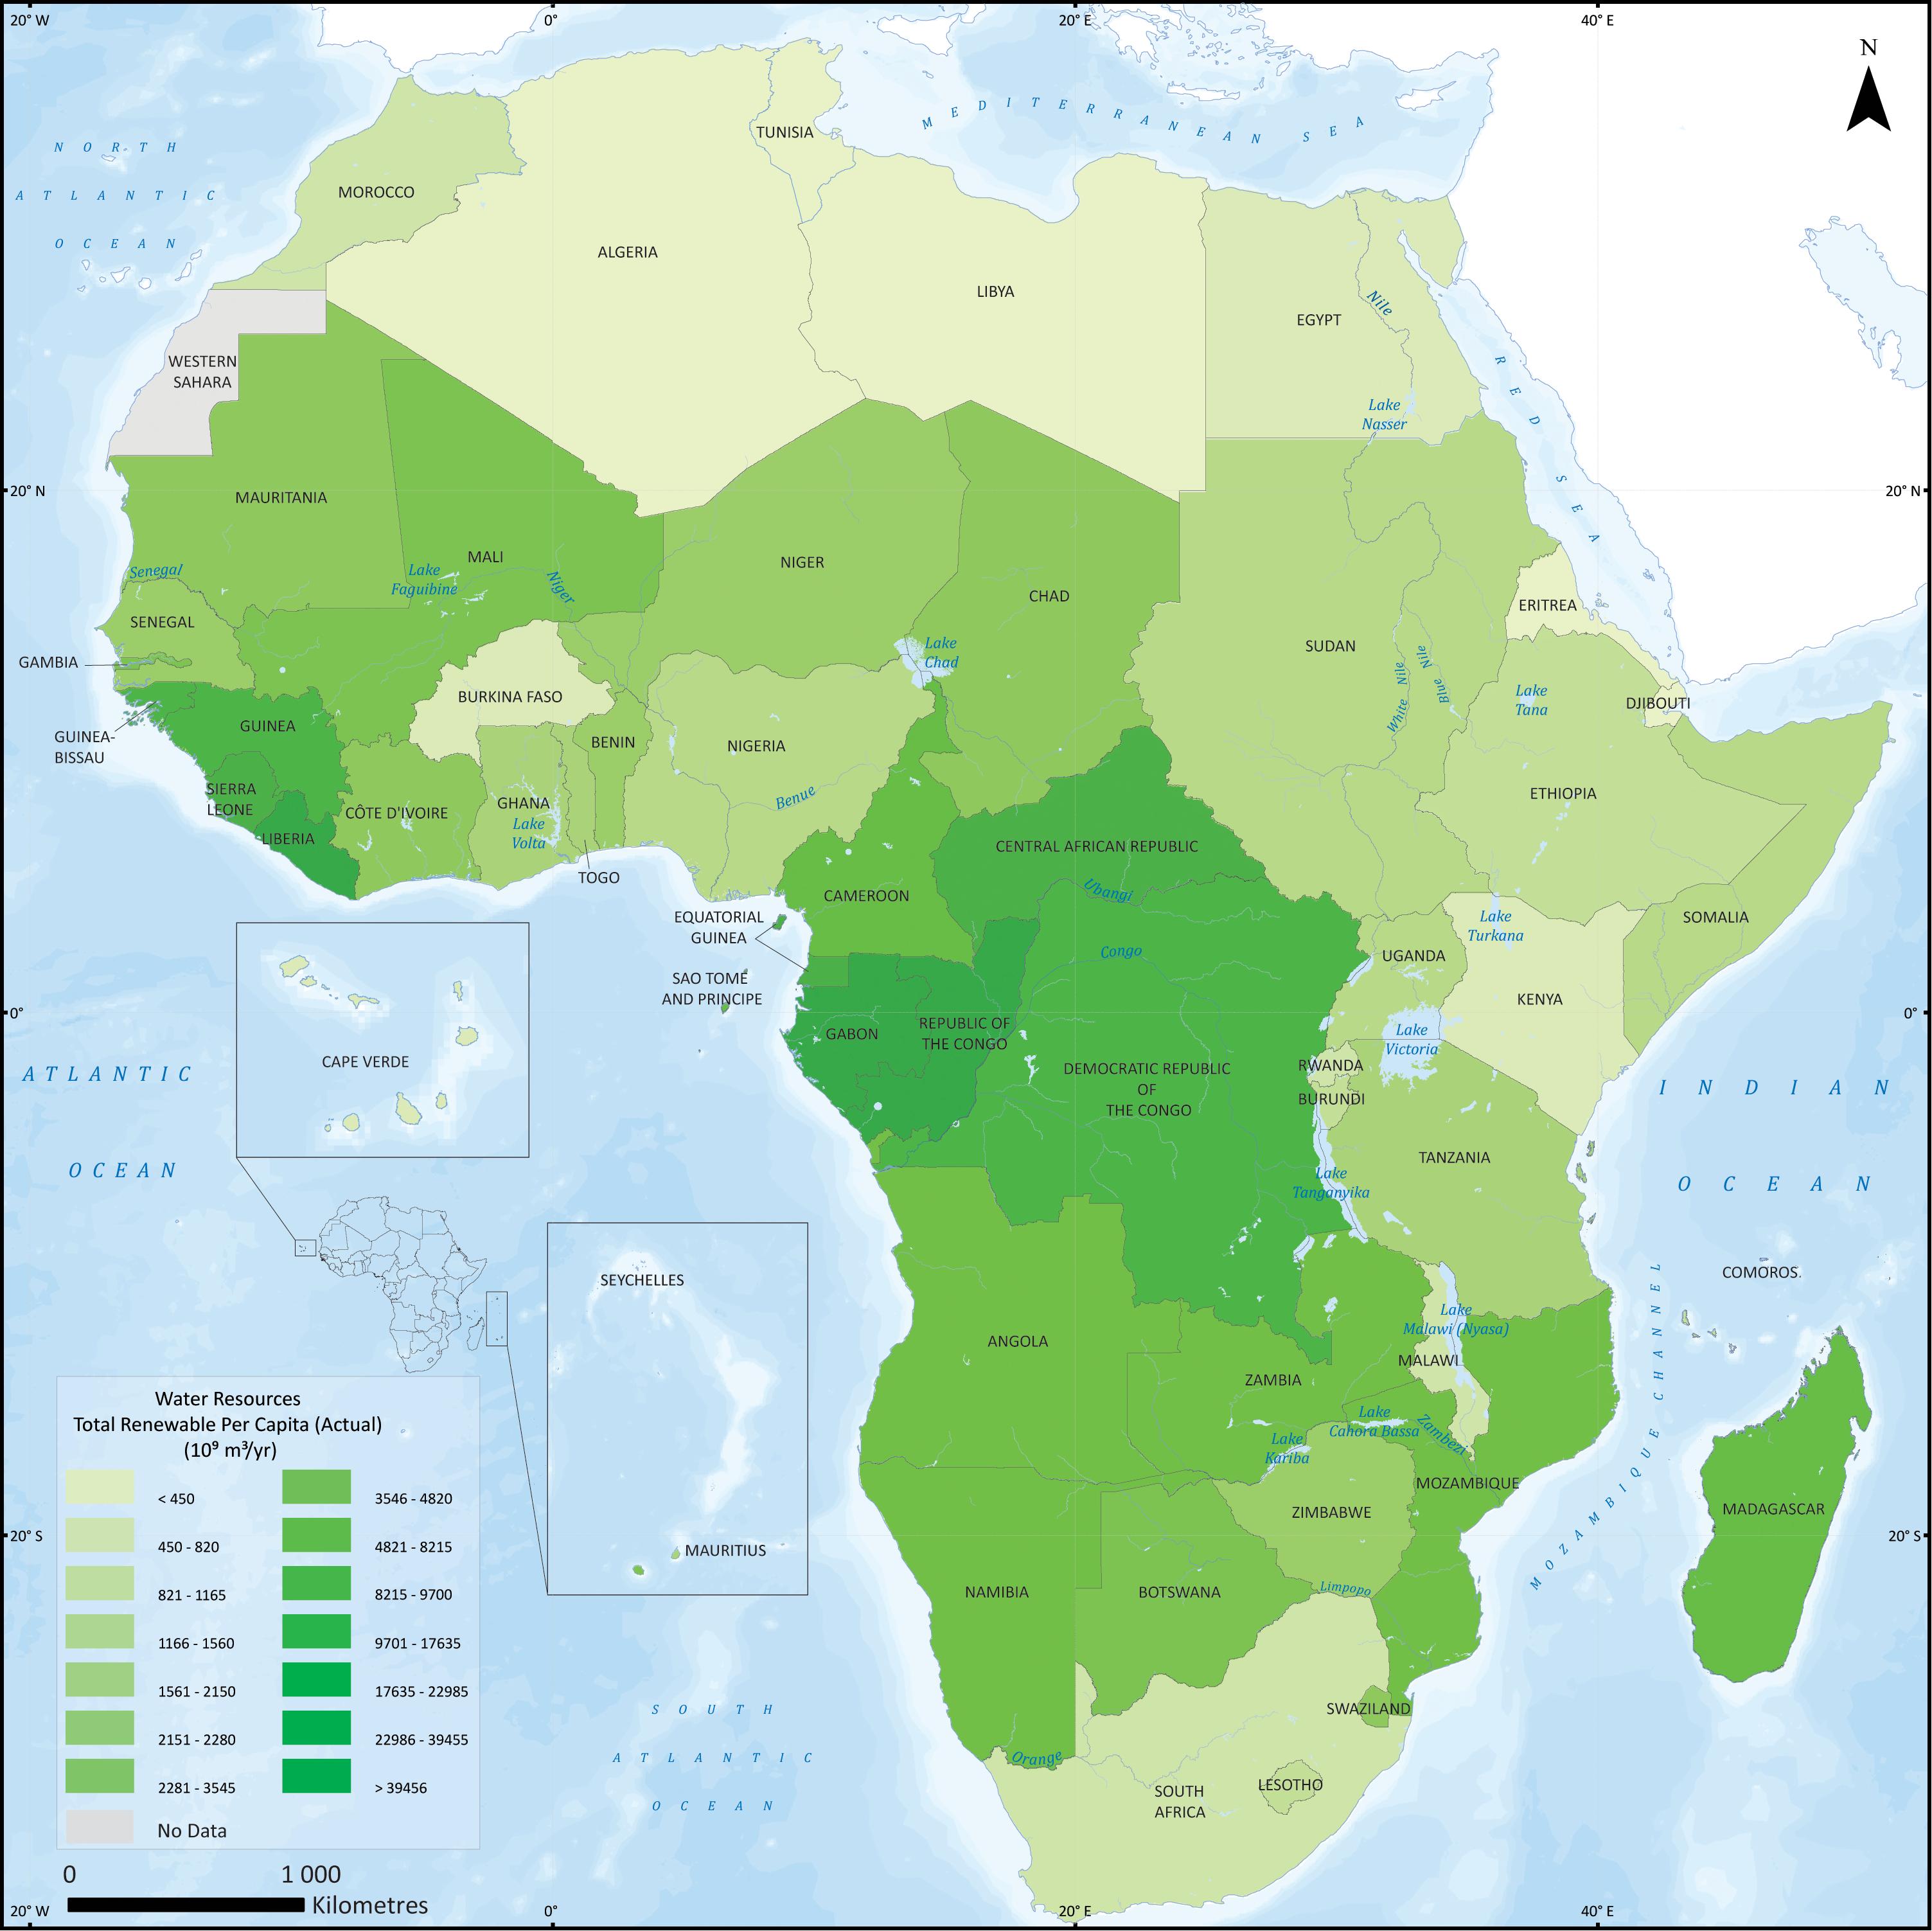 global biodiversity assessment report pdf